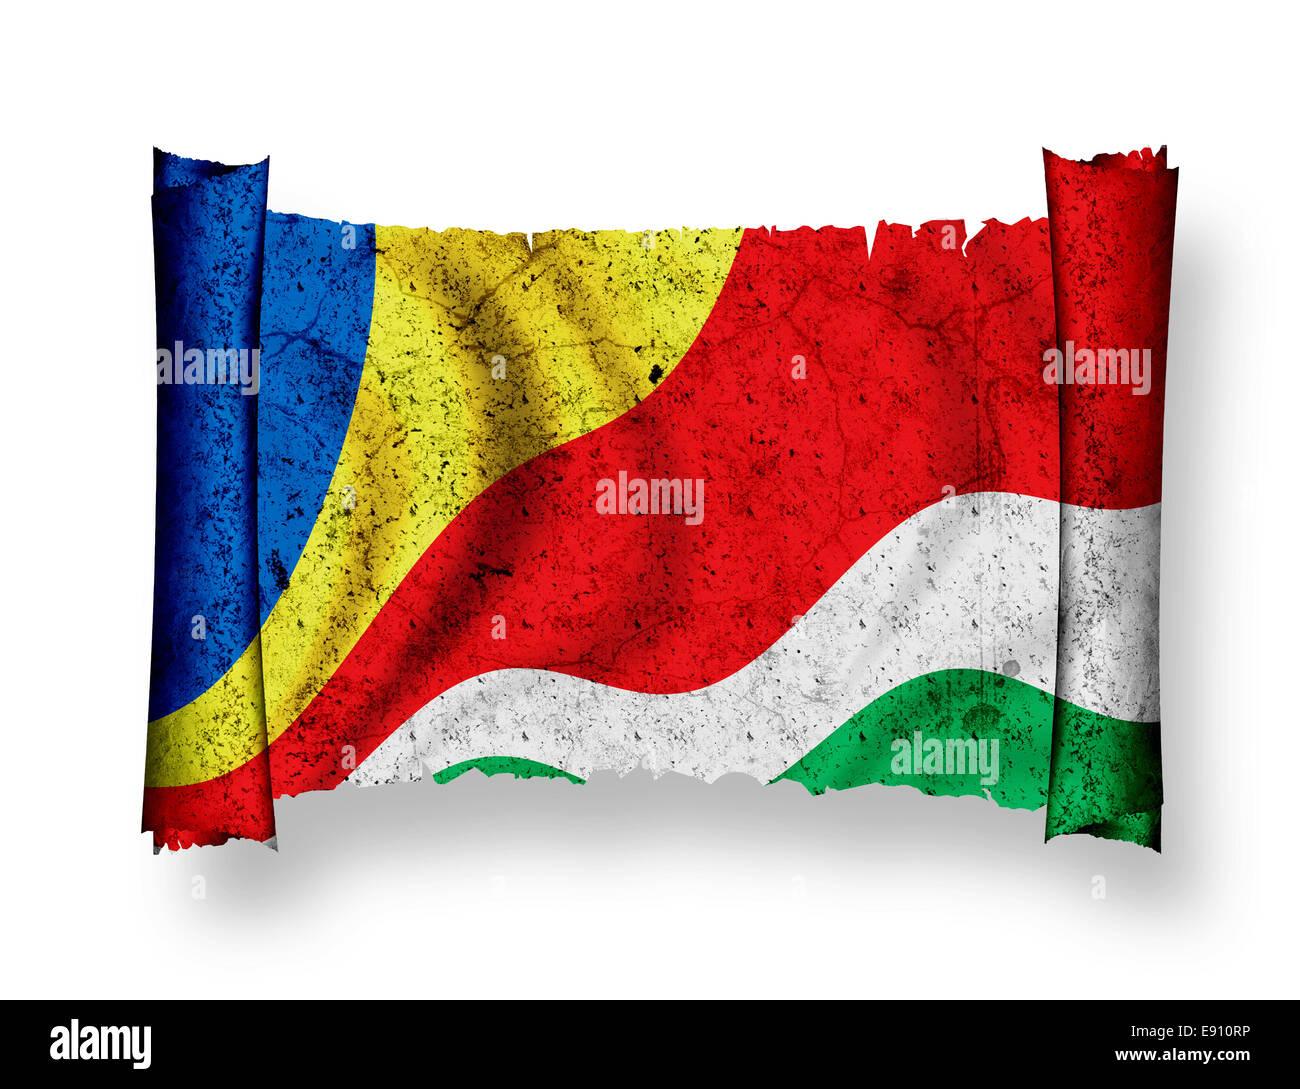 Flag of Seychelles - Stock Image